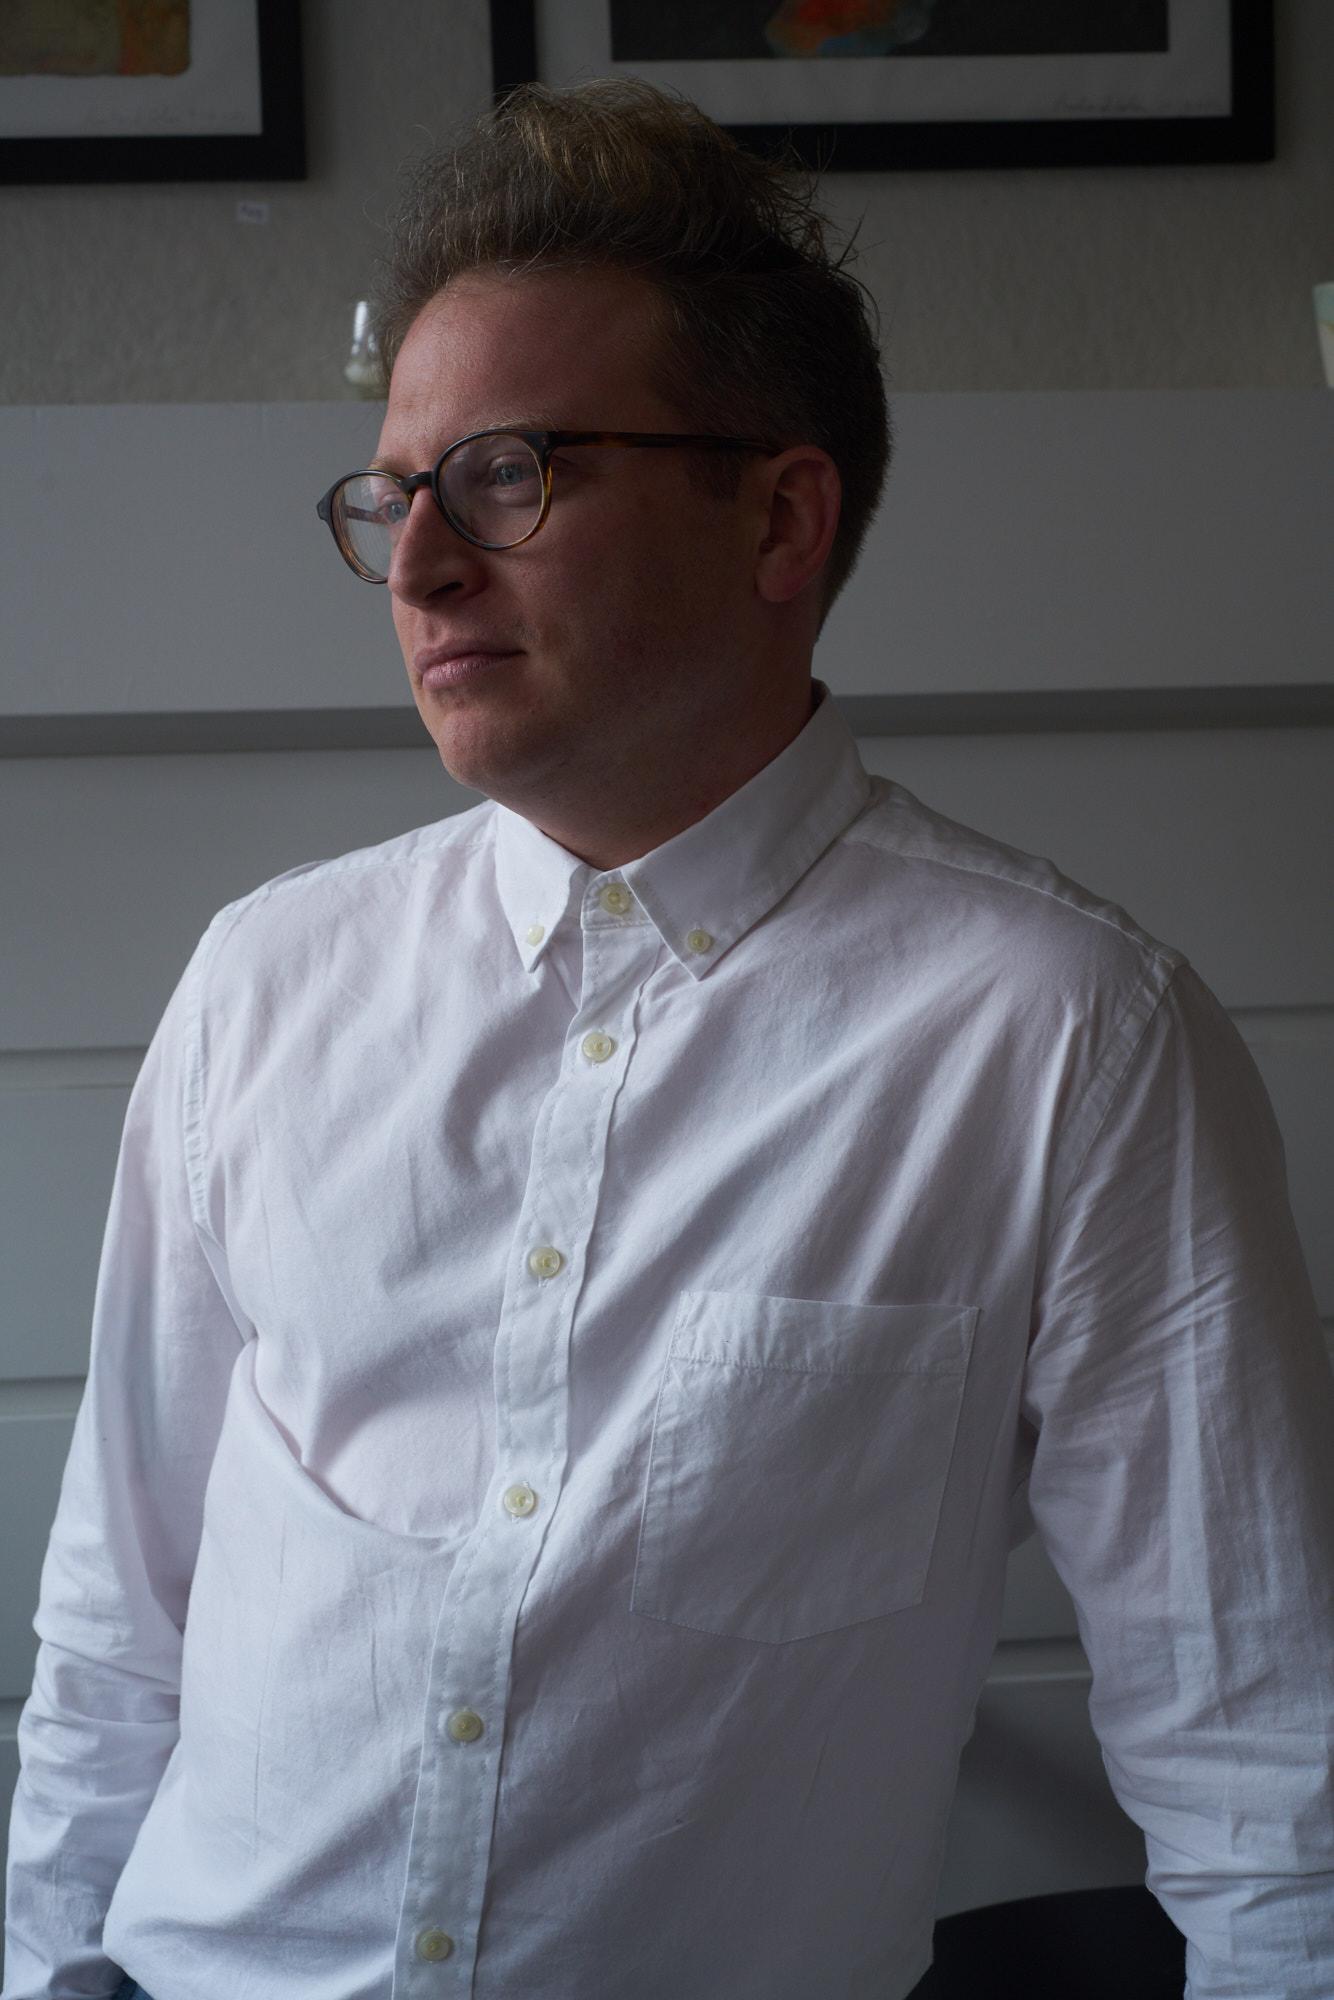 Joshua Lewin, Proprietor - Culinary + Creative Director